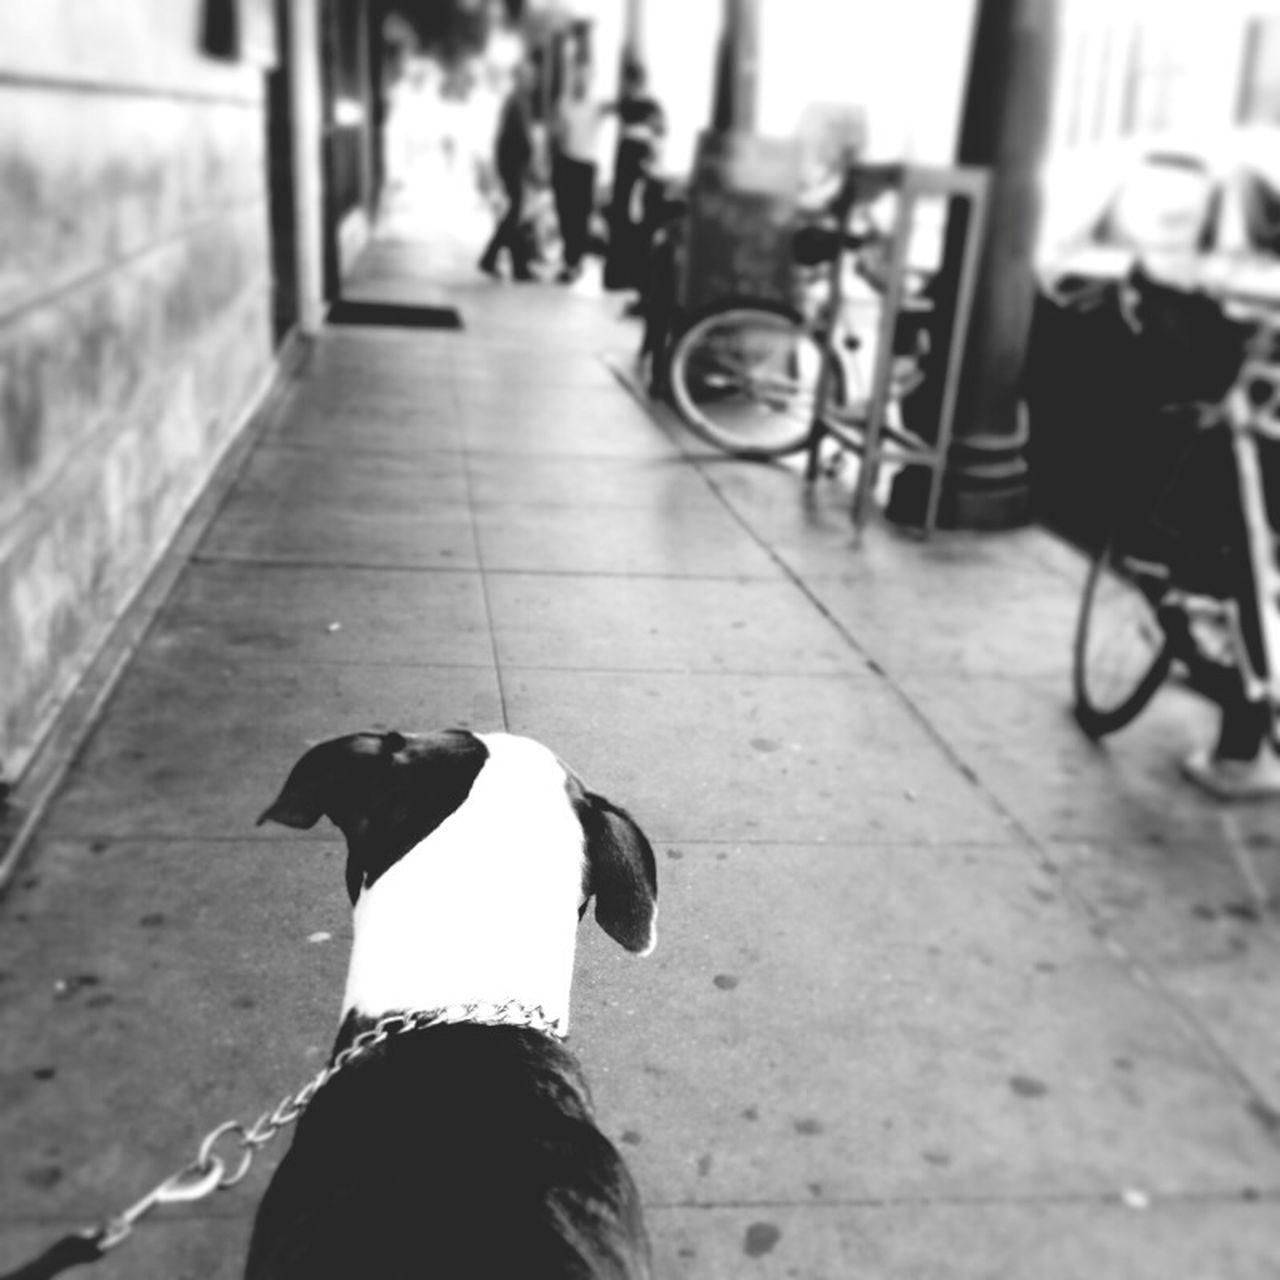 Dog walking on pavement